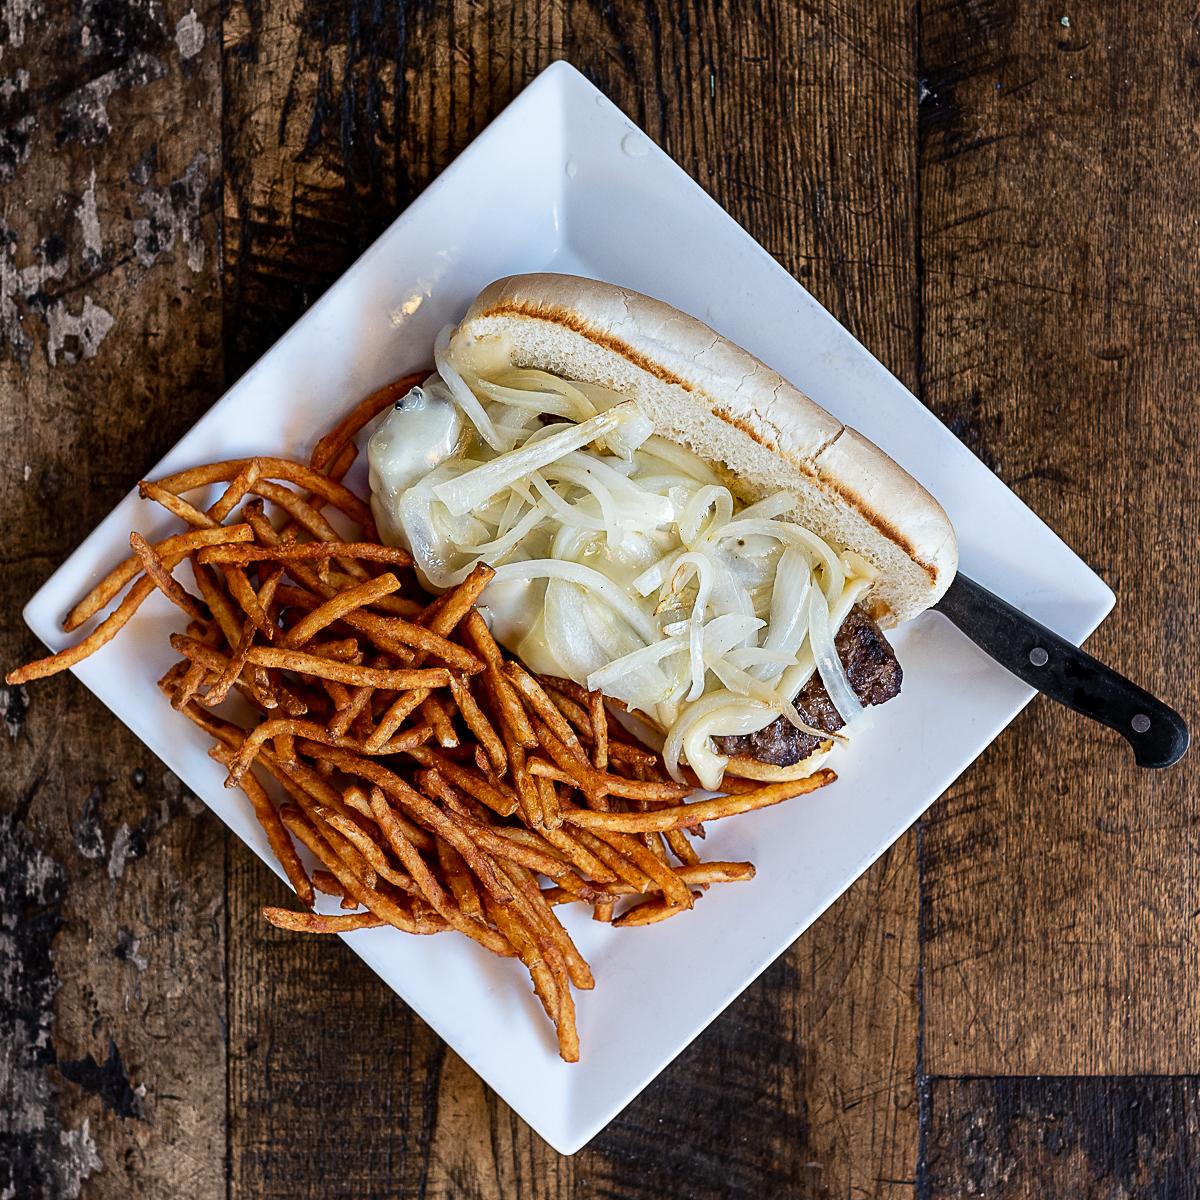 Bobbers Island Grill Steak Sandwich With Jammin Fries